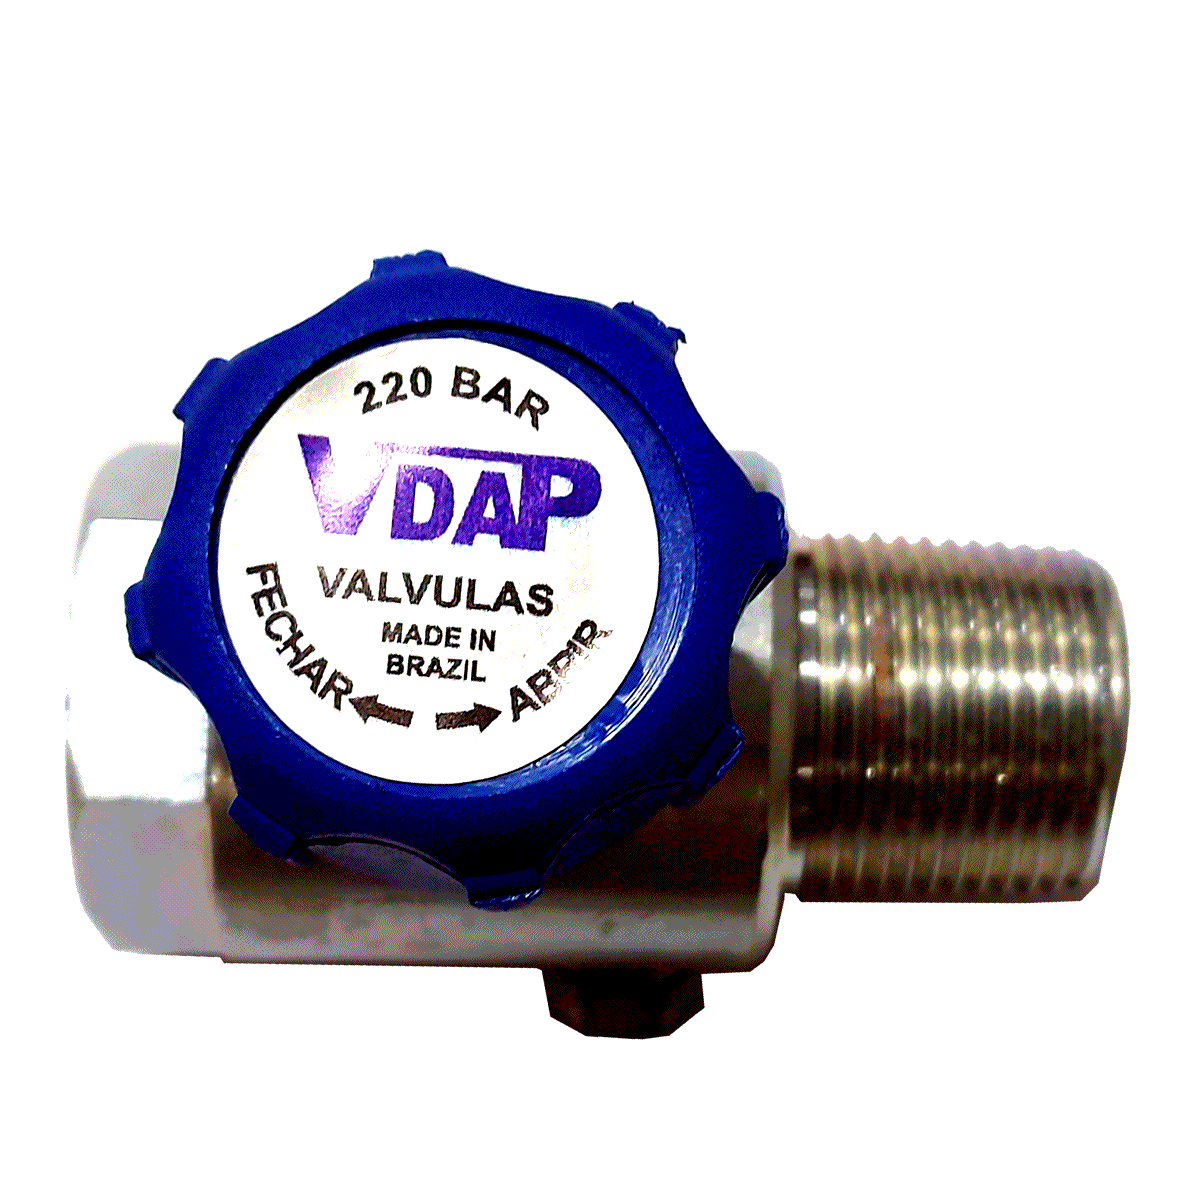 Kit 2 Válvulas VDAP Abastecimento Externo e Cilindro